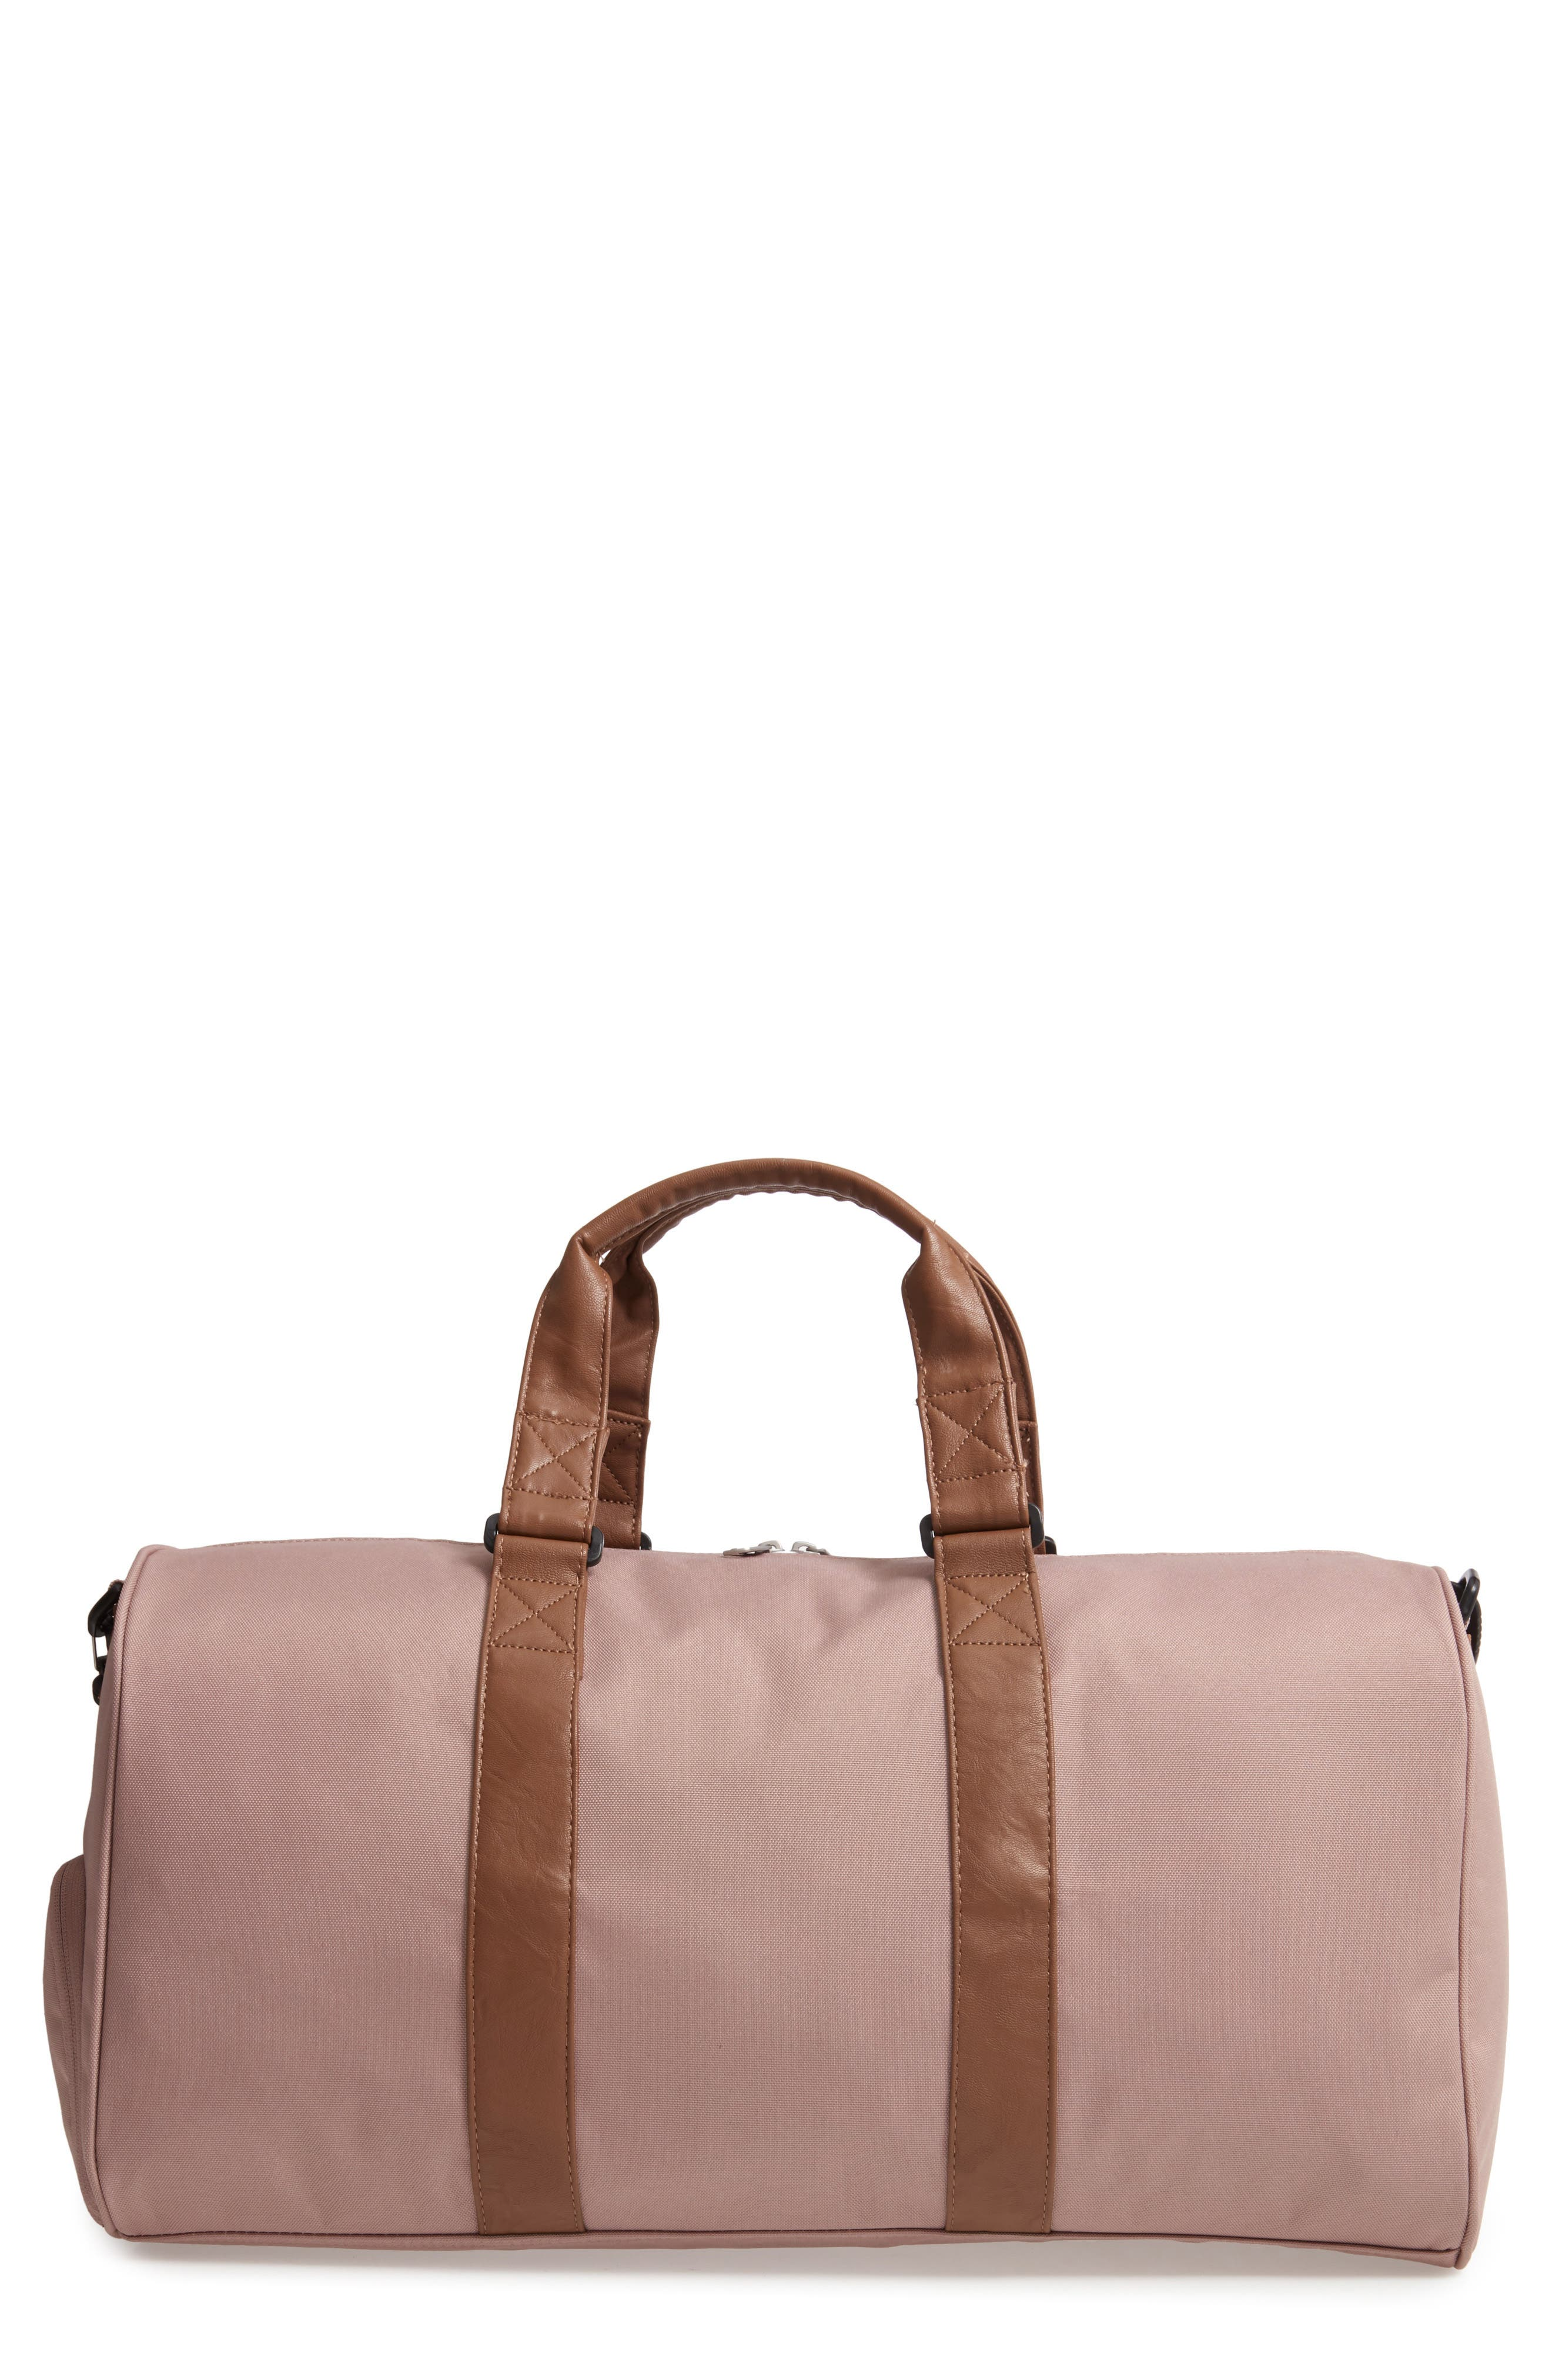 Novel Canvas Duffel Bag,                         Main,                         color, ASH ROSE/TAN